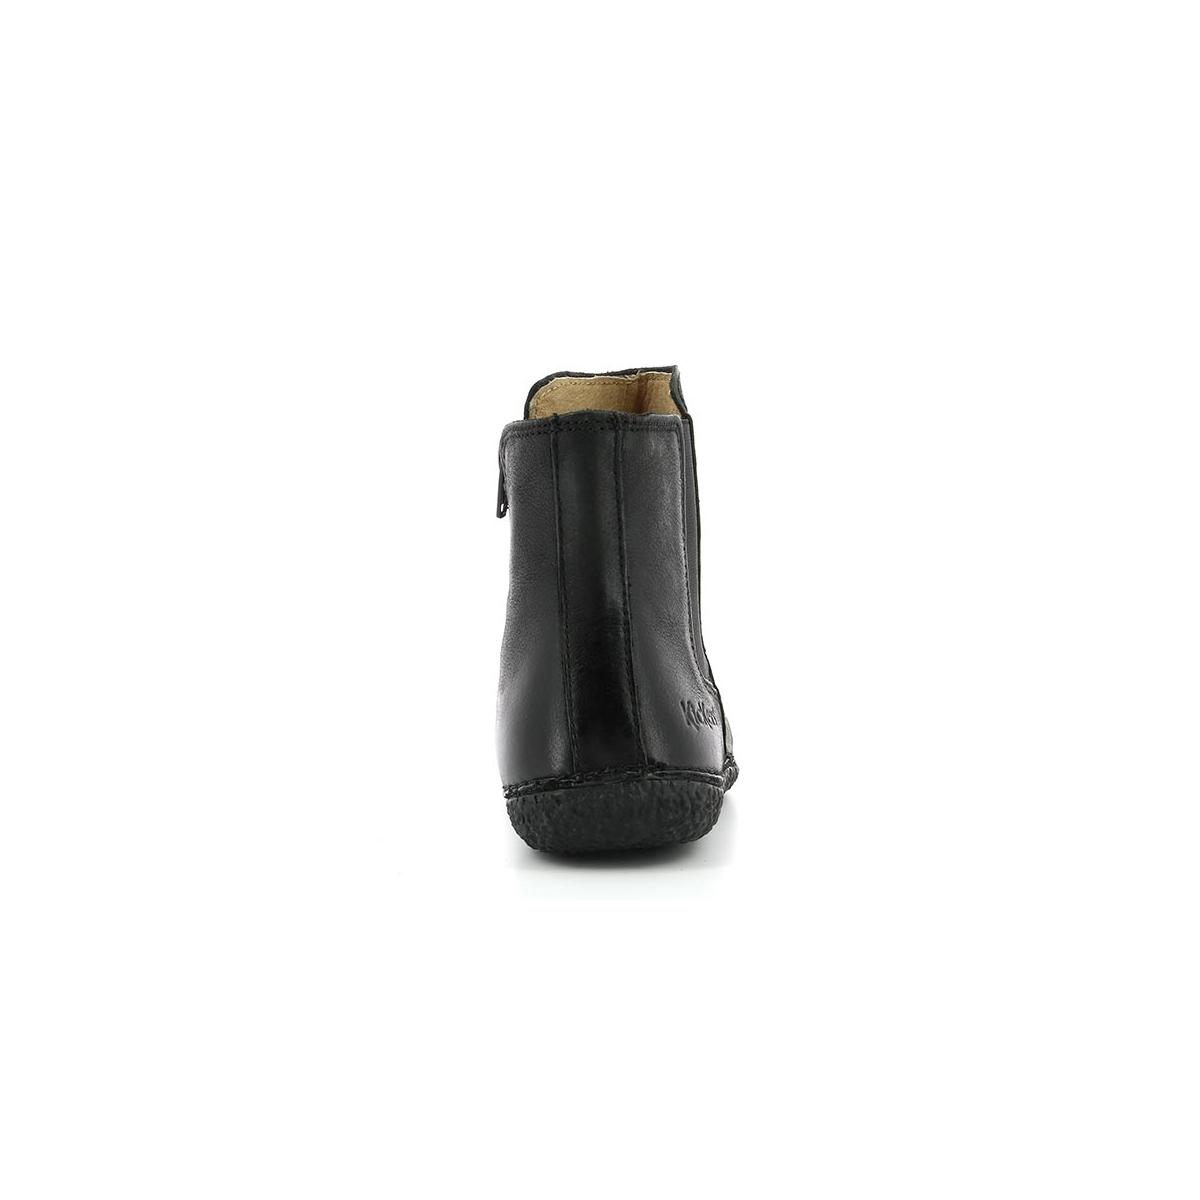 Noir Femme Kickers Chaussures Chaussures Happli Femme Kickers Noir Happli g5RwqWdng